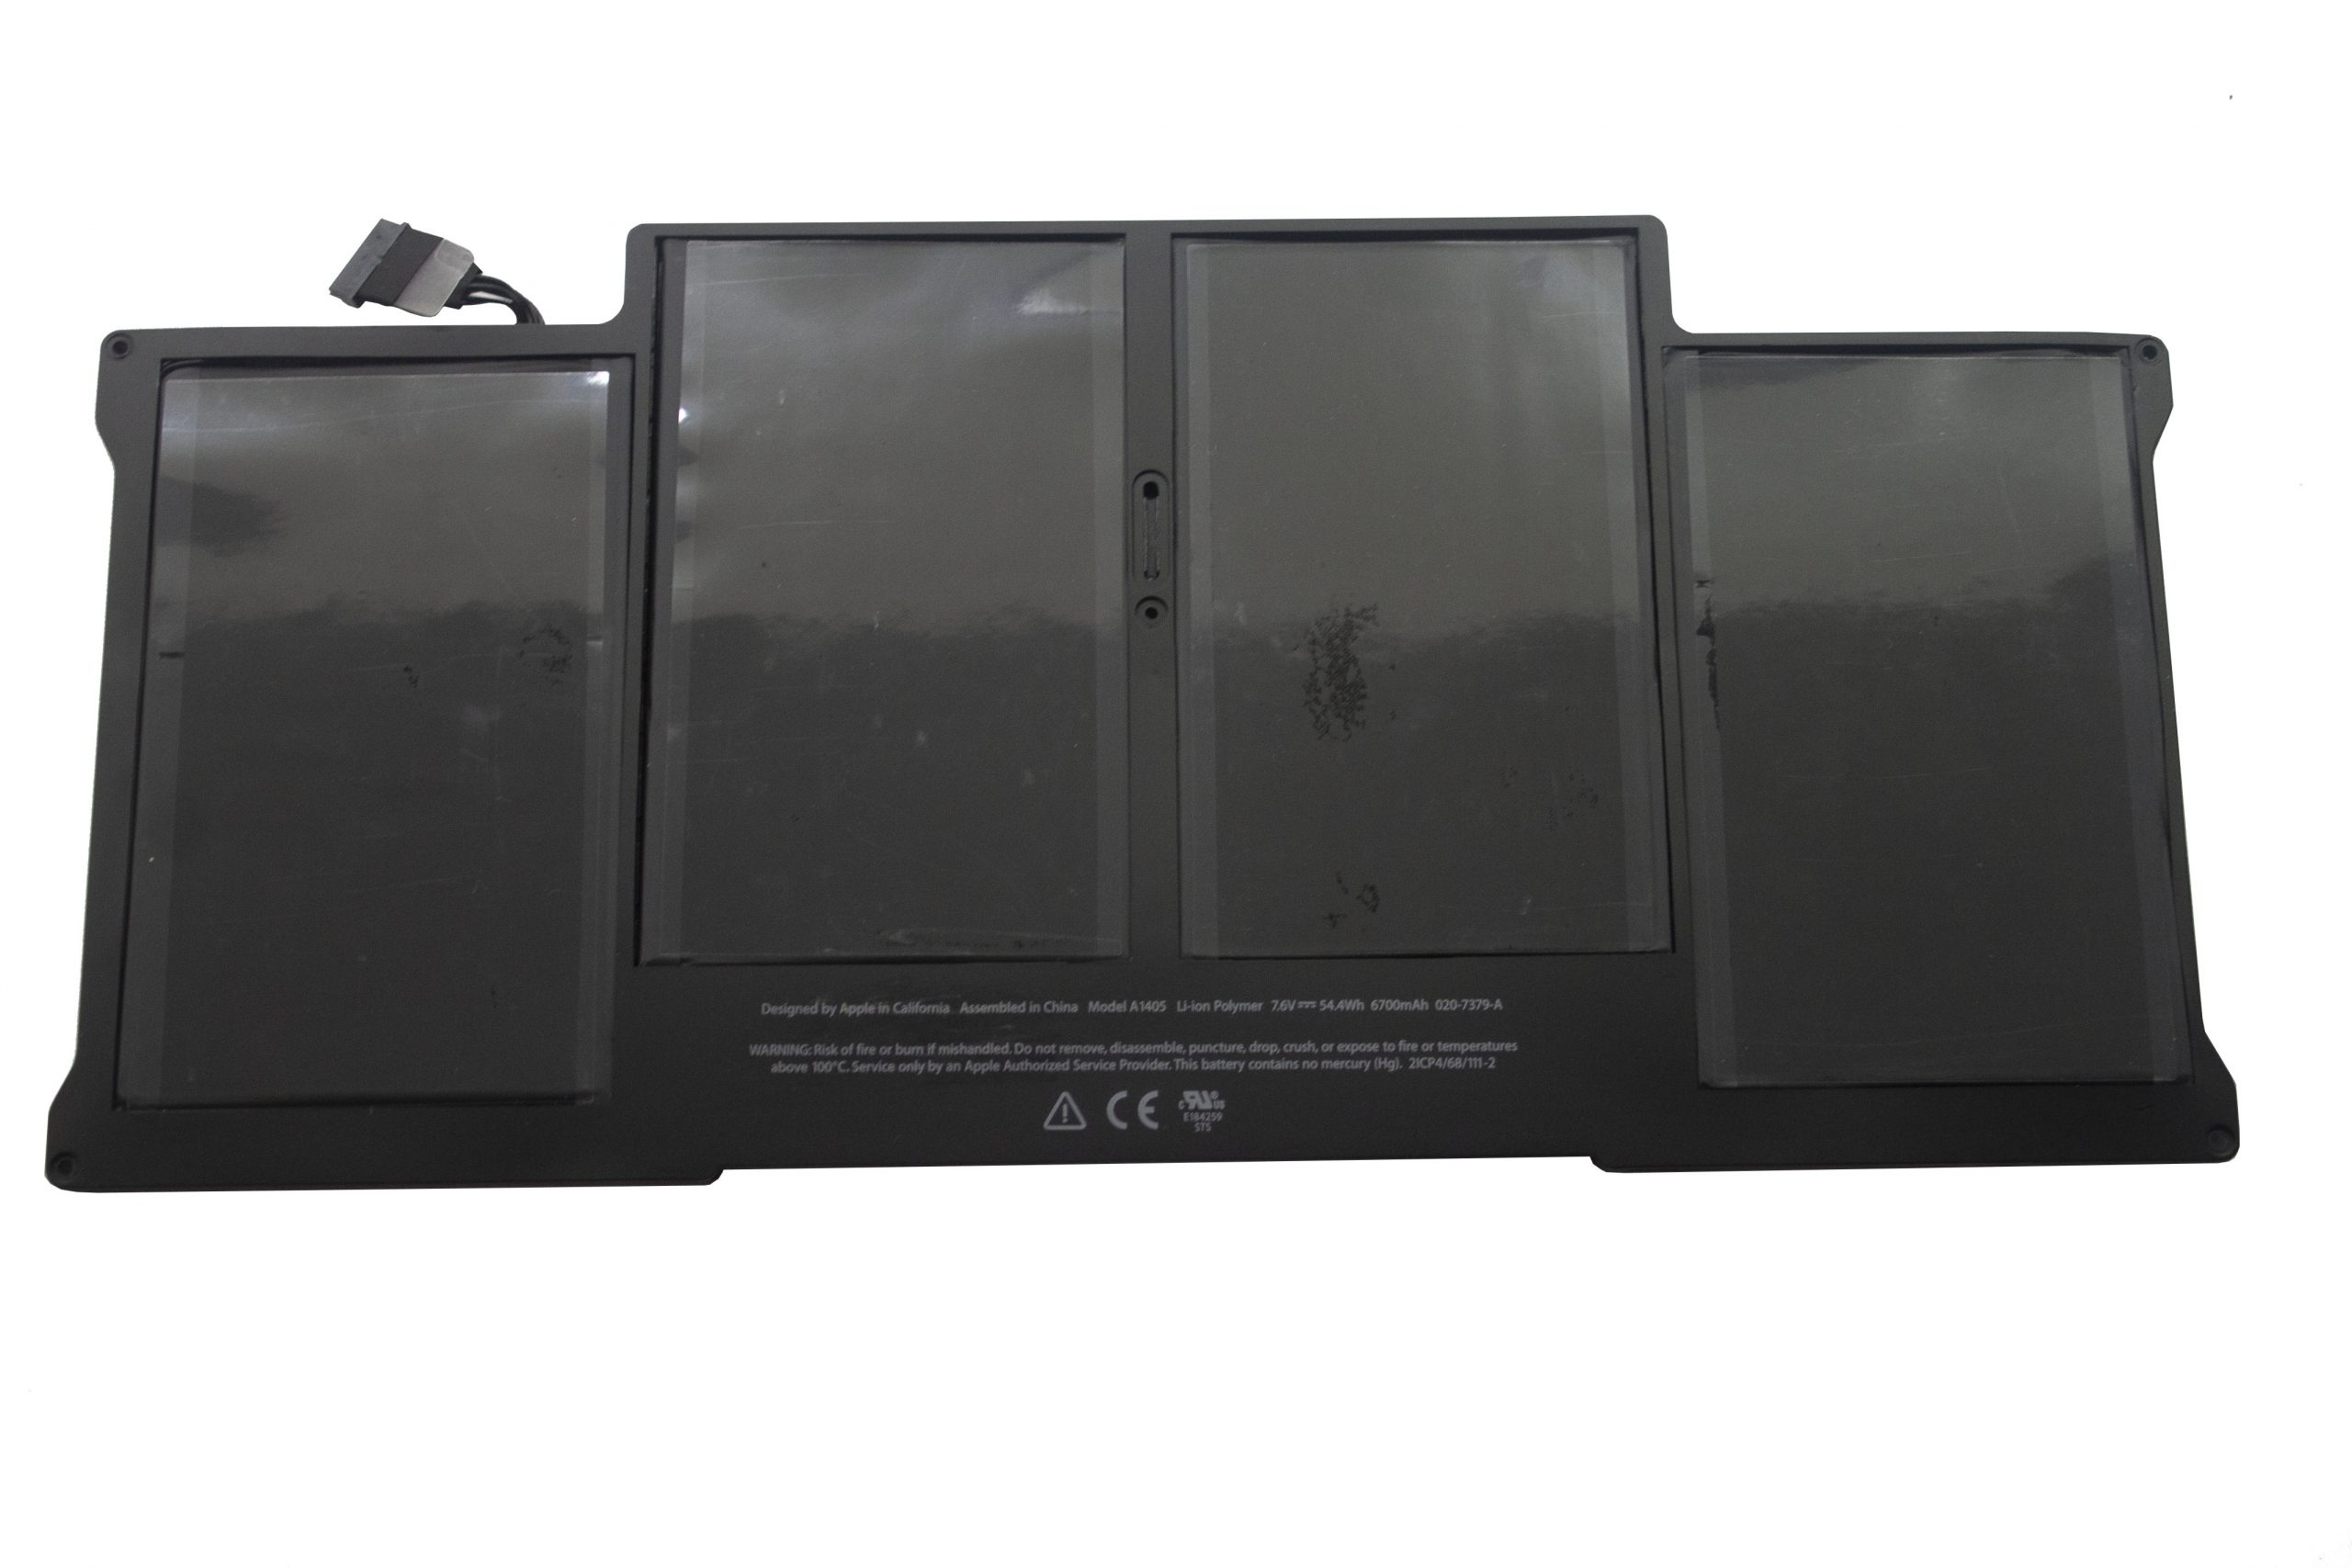 Accu voor MacBook Air A1466 (2011 - 2012) en A1369